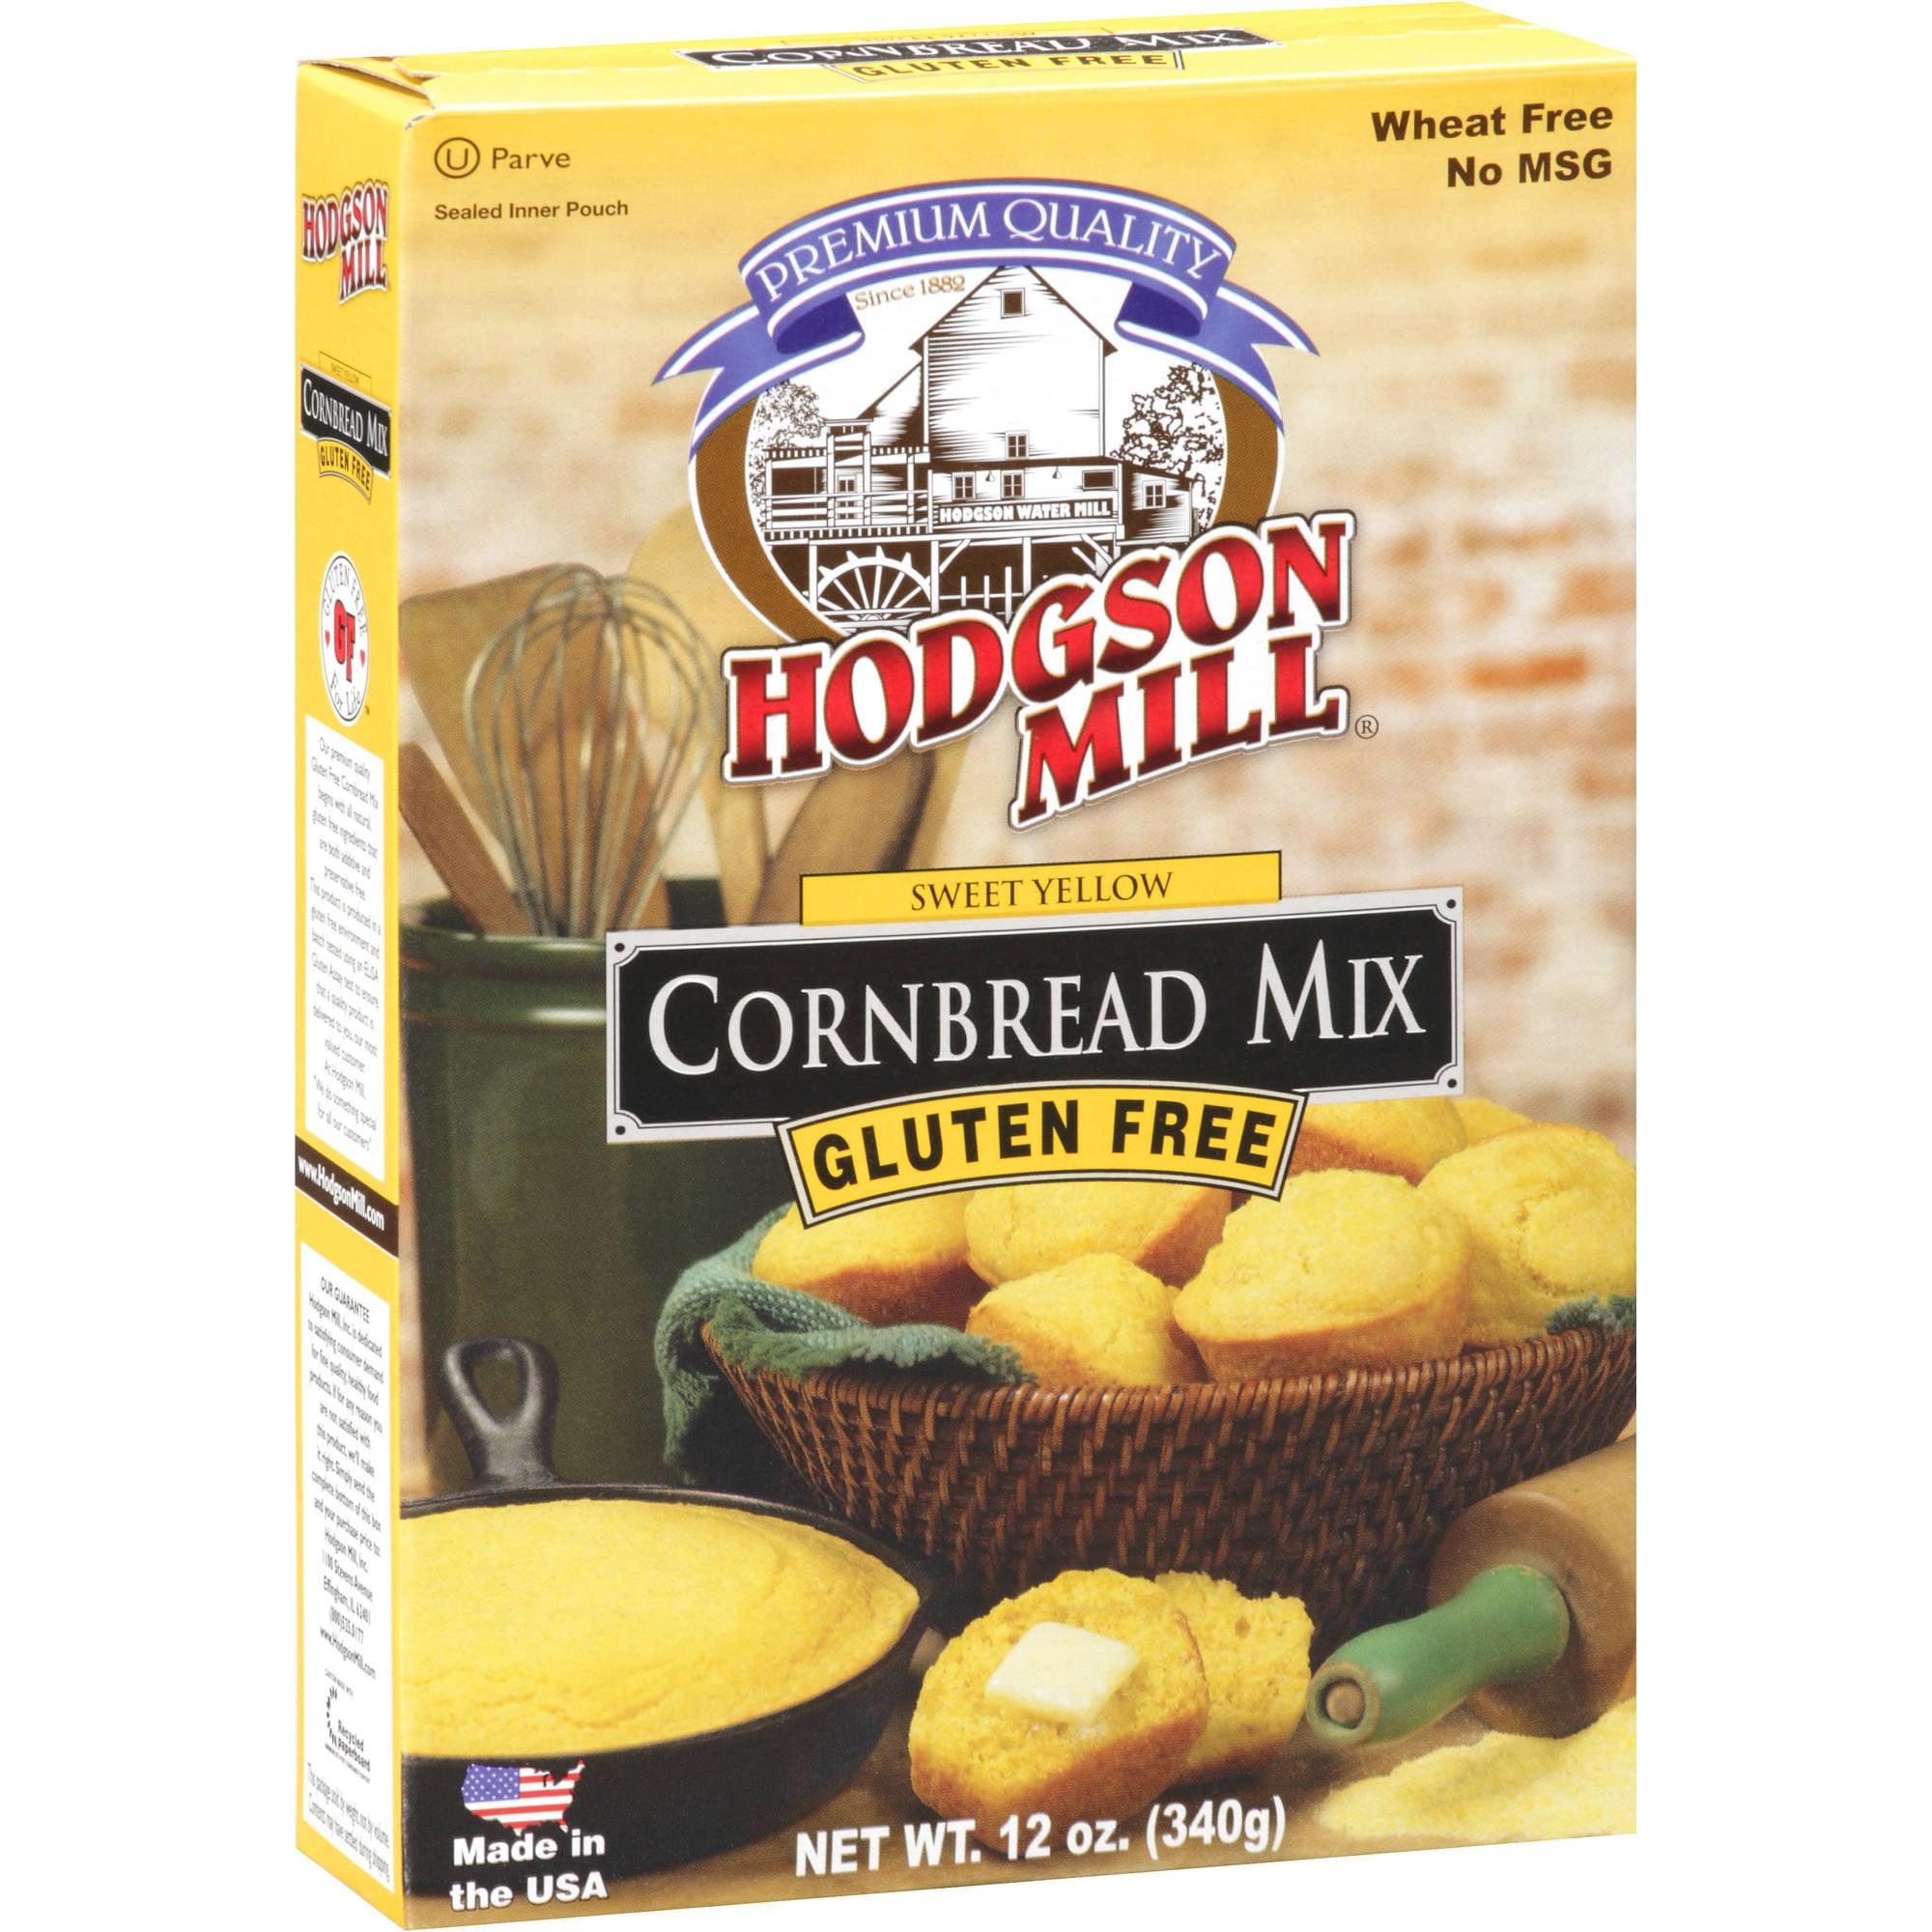 Hodgson Mill Gluten Free Sweet Yellow Cornbread Mix, 12 oz